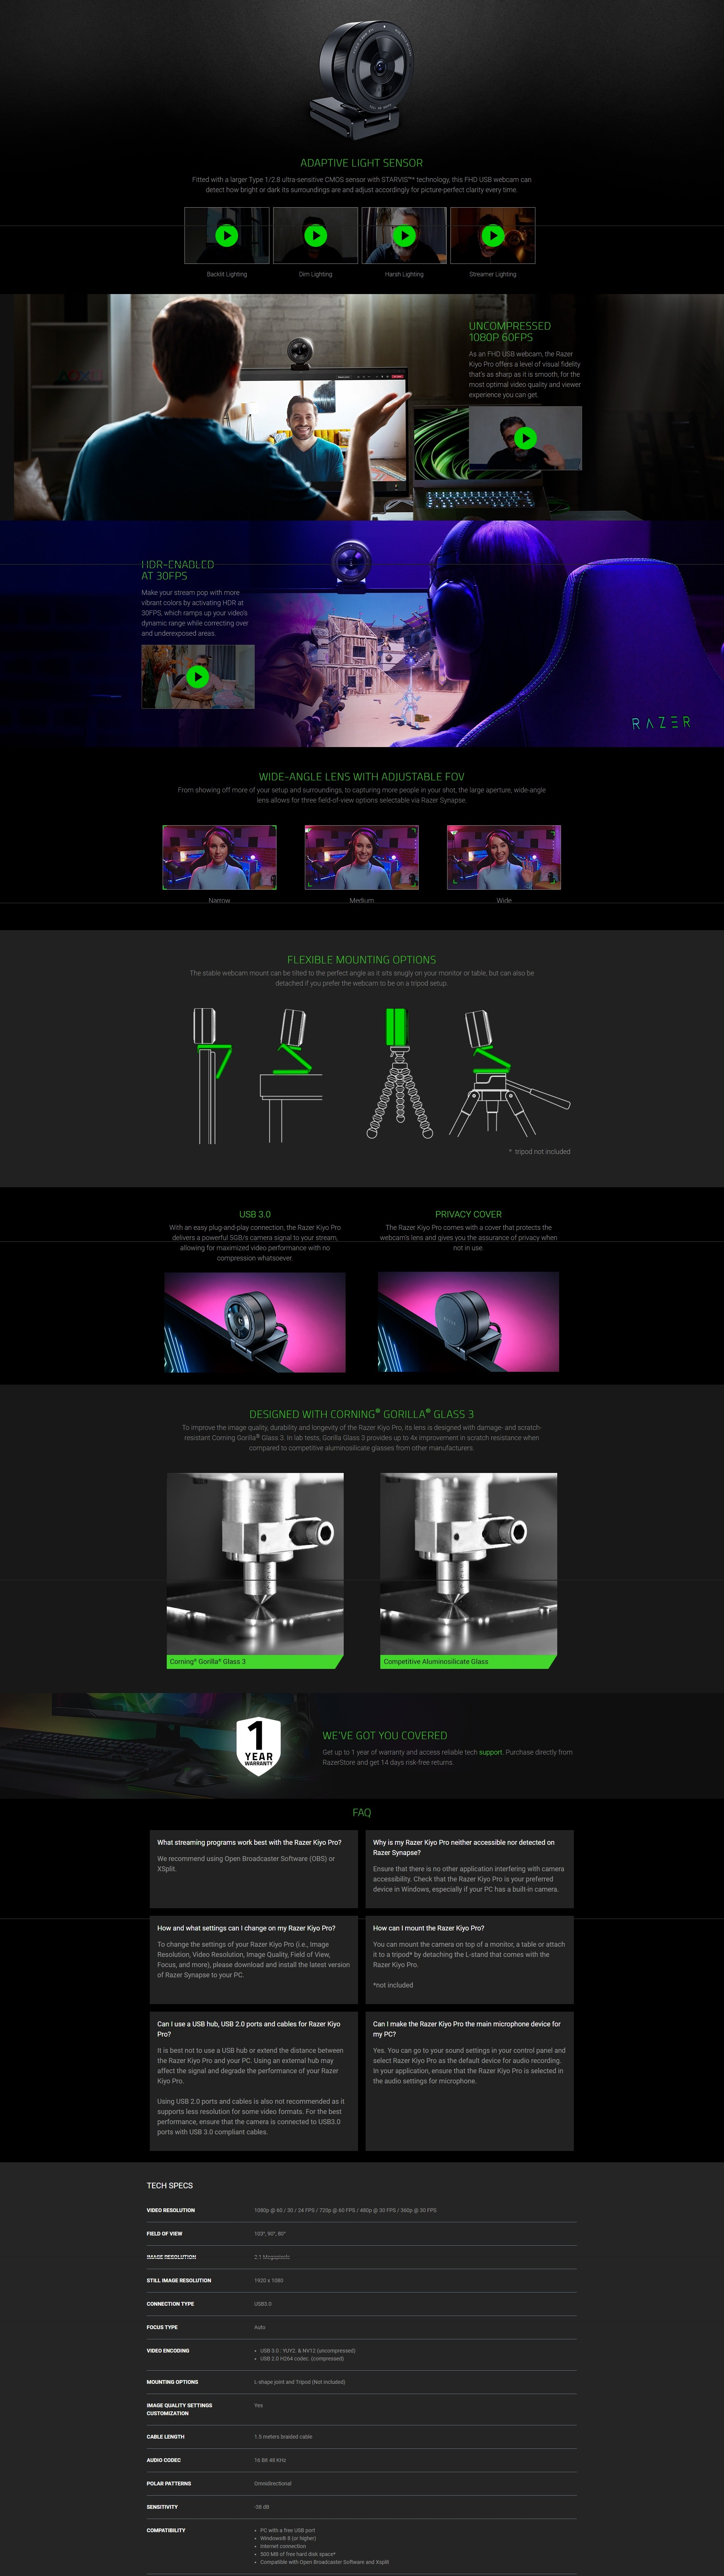 A large marketing image providing additional information about the product Razer Kiyo Pro - USB Camera with High-Performance Adaptive Light Sensor  - Additional alt info not provided